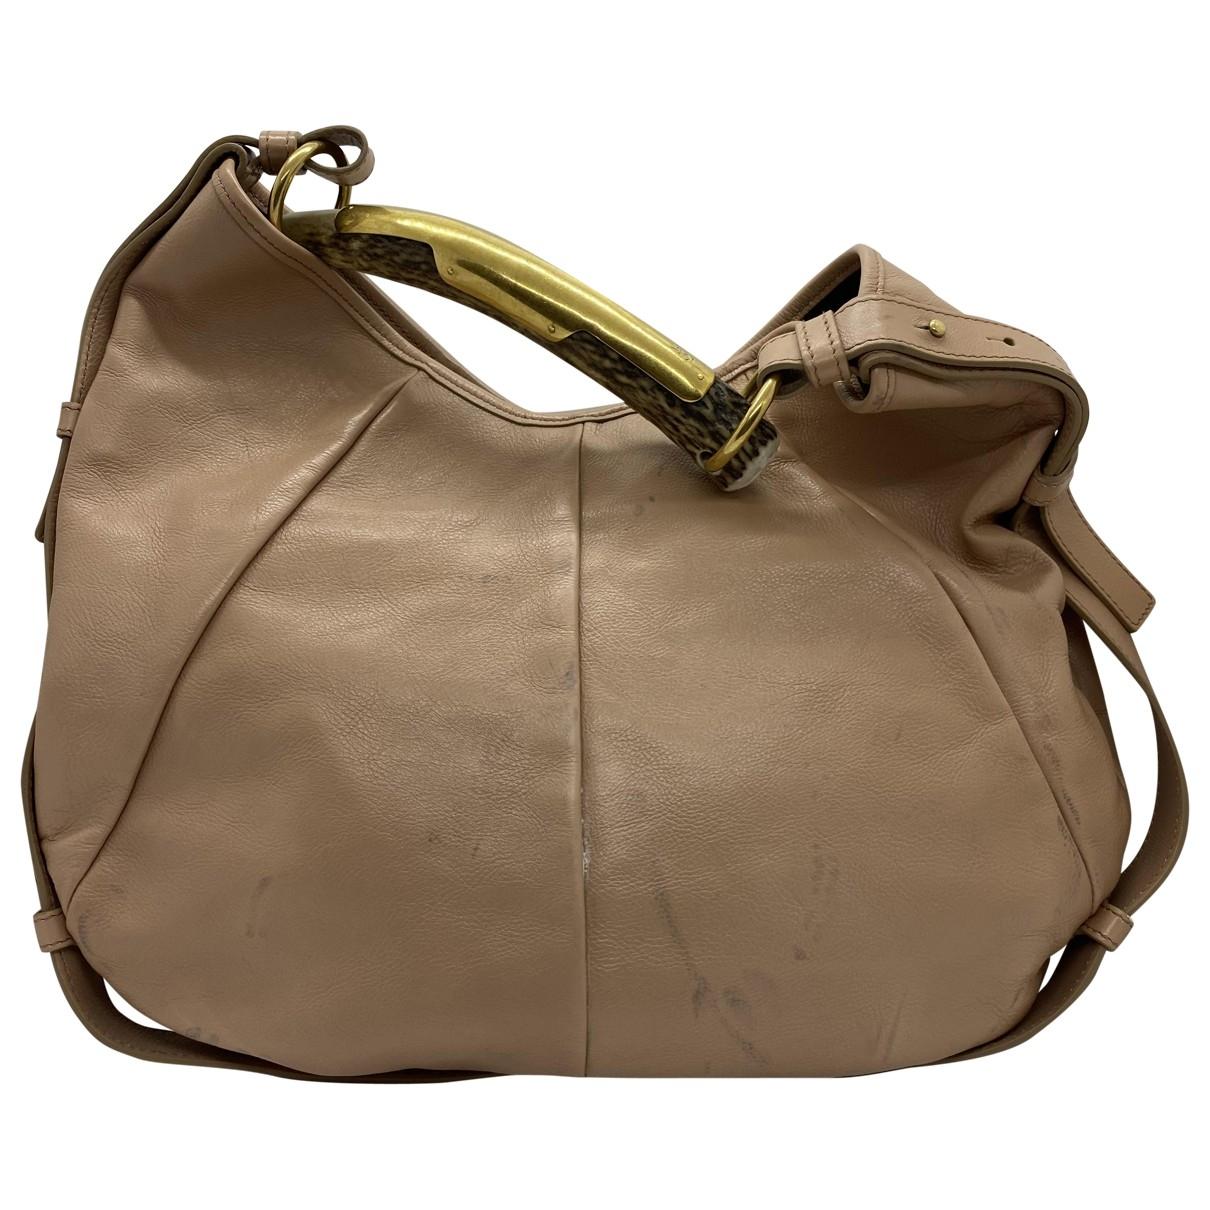 Yves Saint Laurent \N Handtasche in  Beige Leder